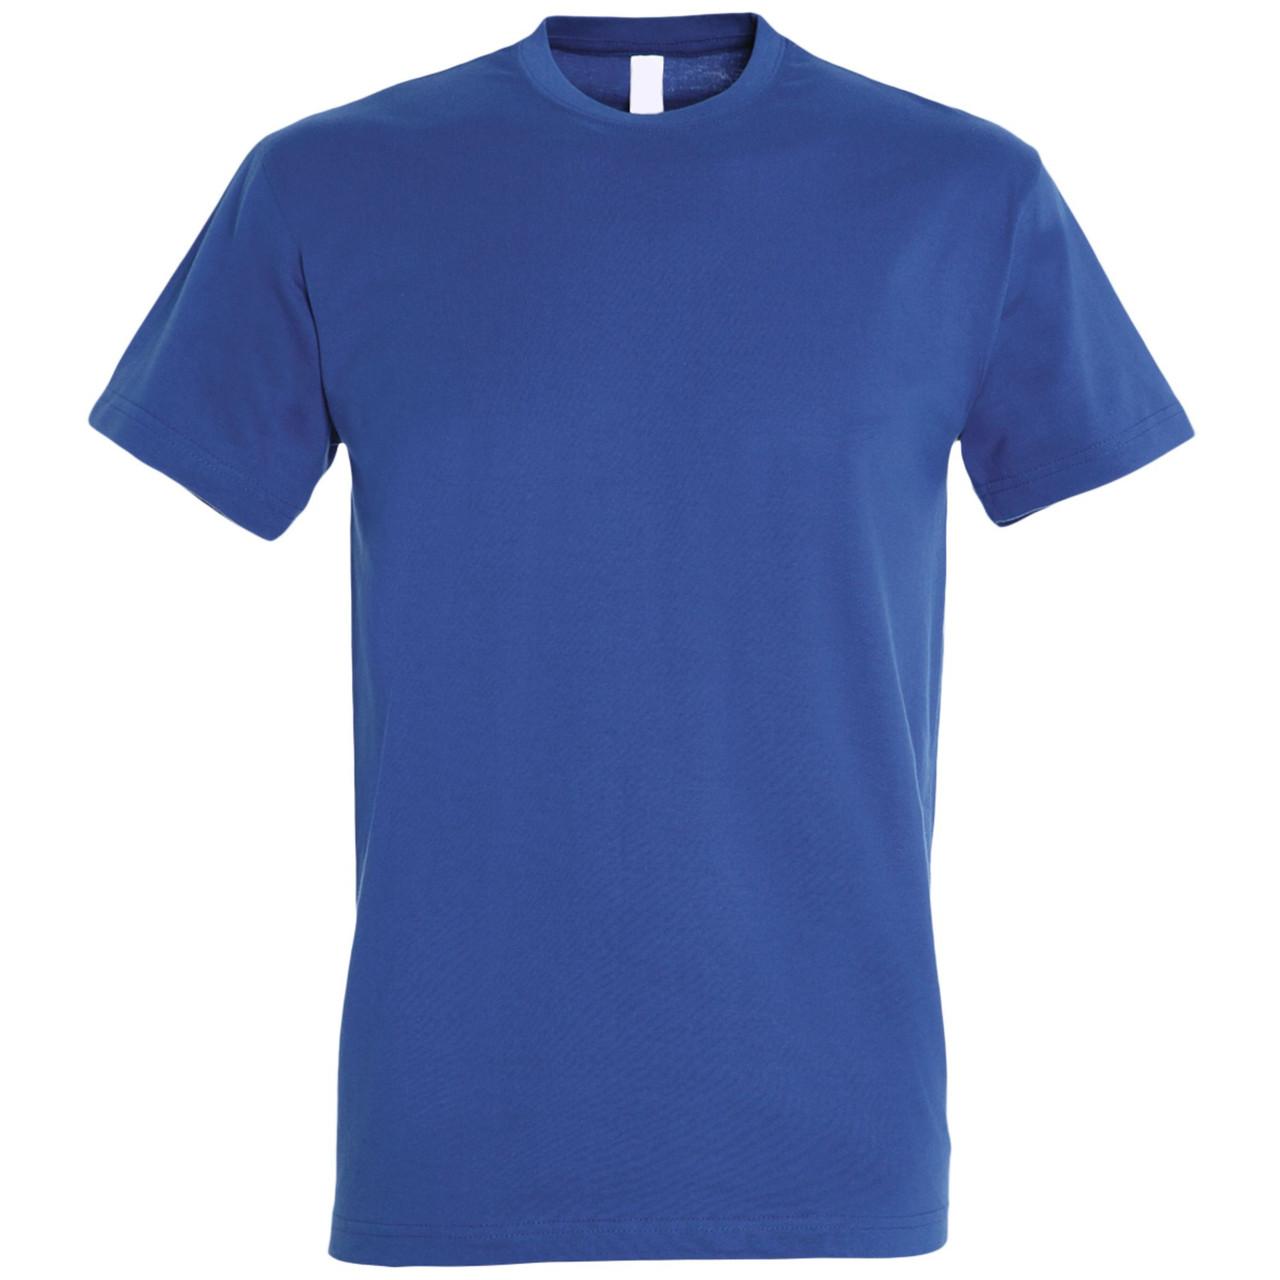 Oднотонная футболка | Синяя | 160 гр. | XS